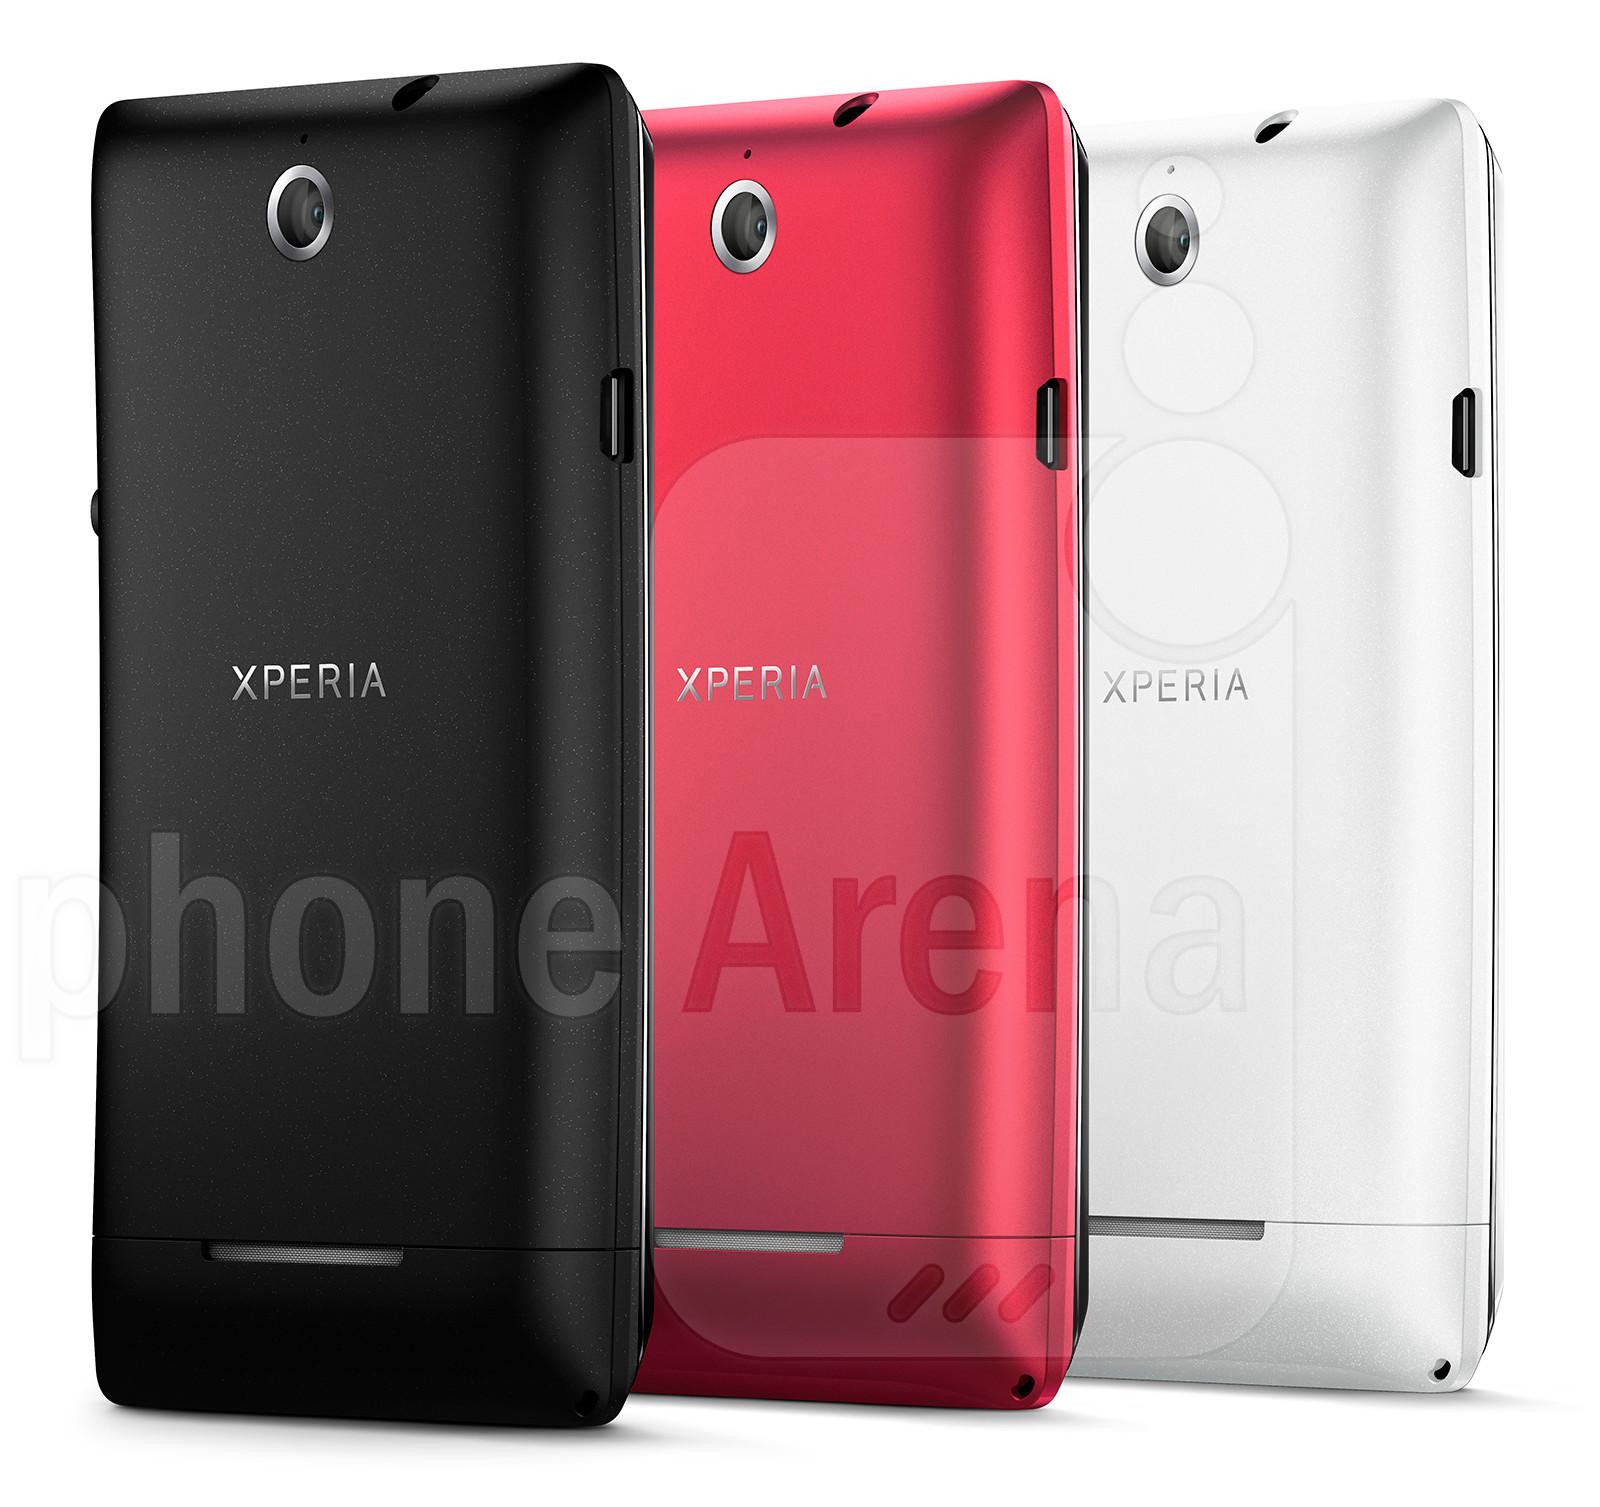 Sony Xperia E specs